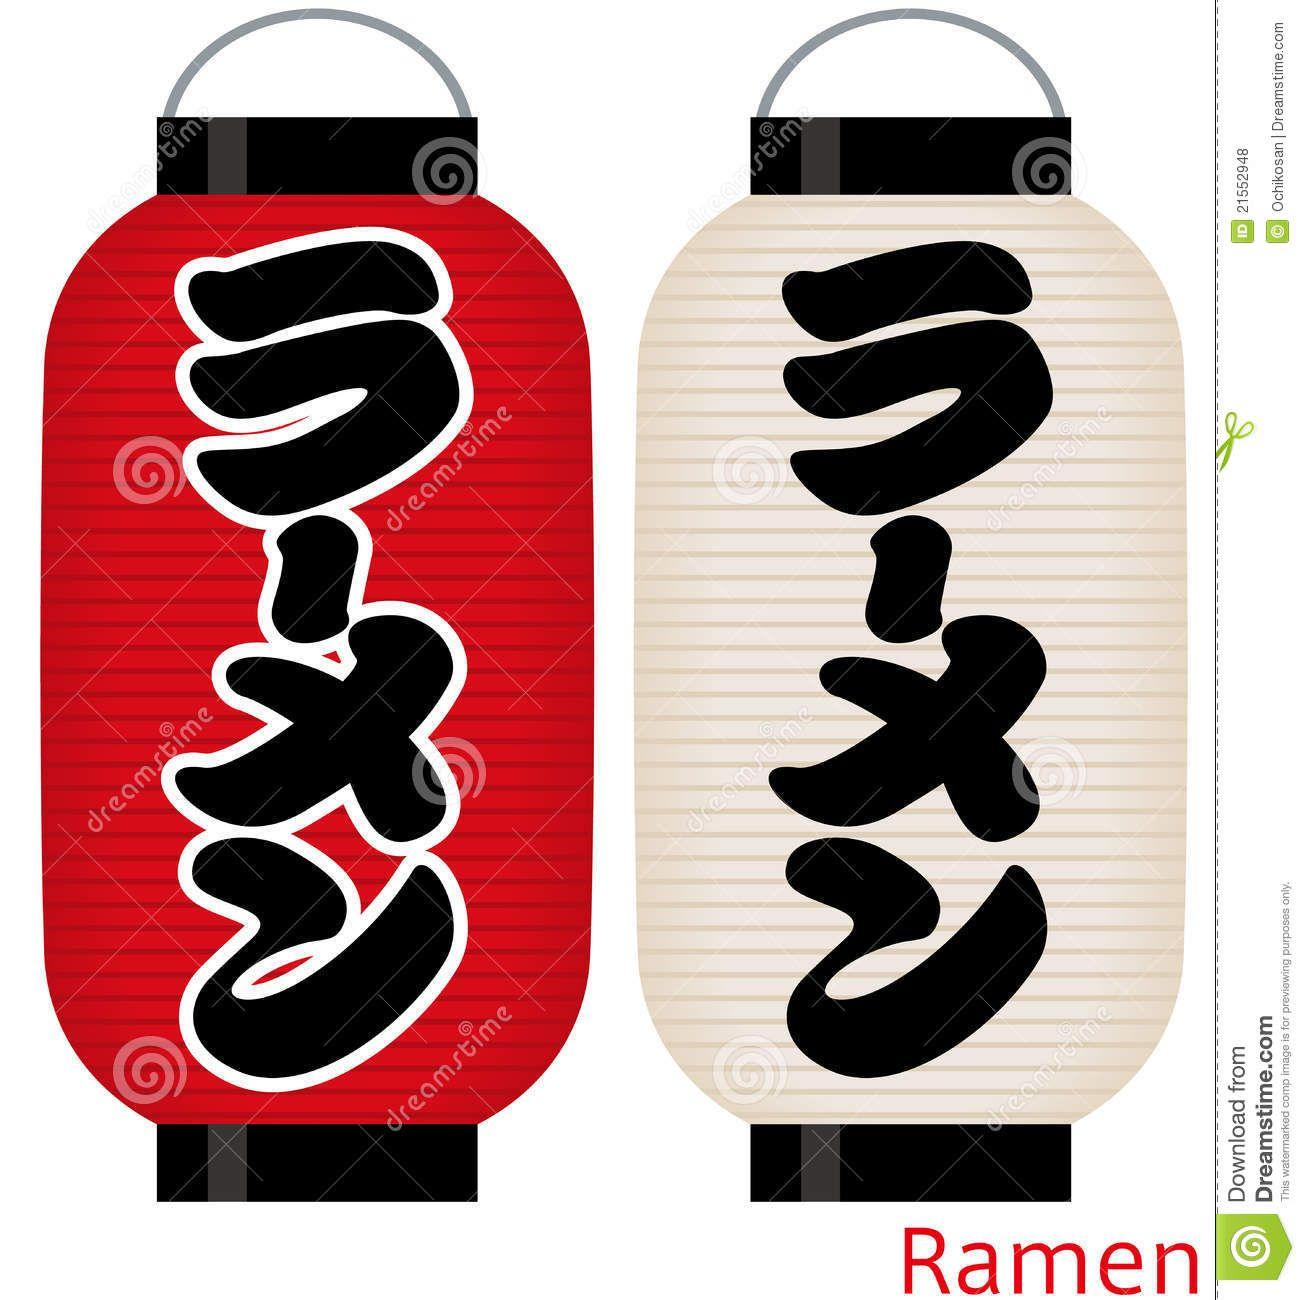 japanese lantern vector - Google Search | Types of Light | Pinterest for Japanese Lamp Vector  61obs